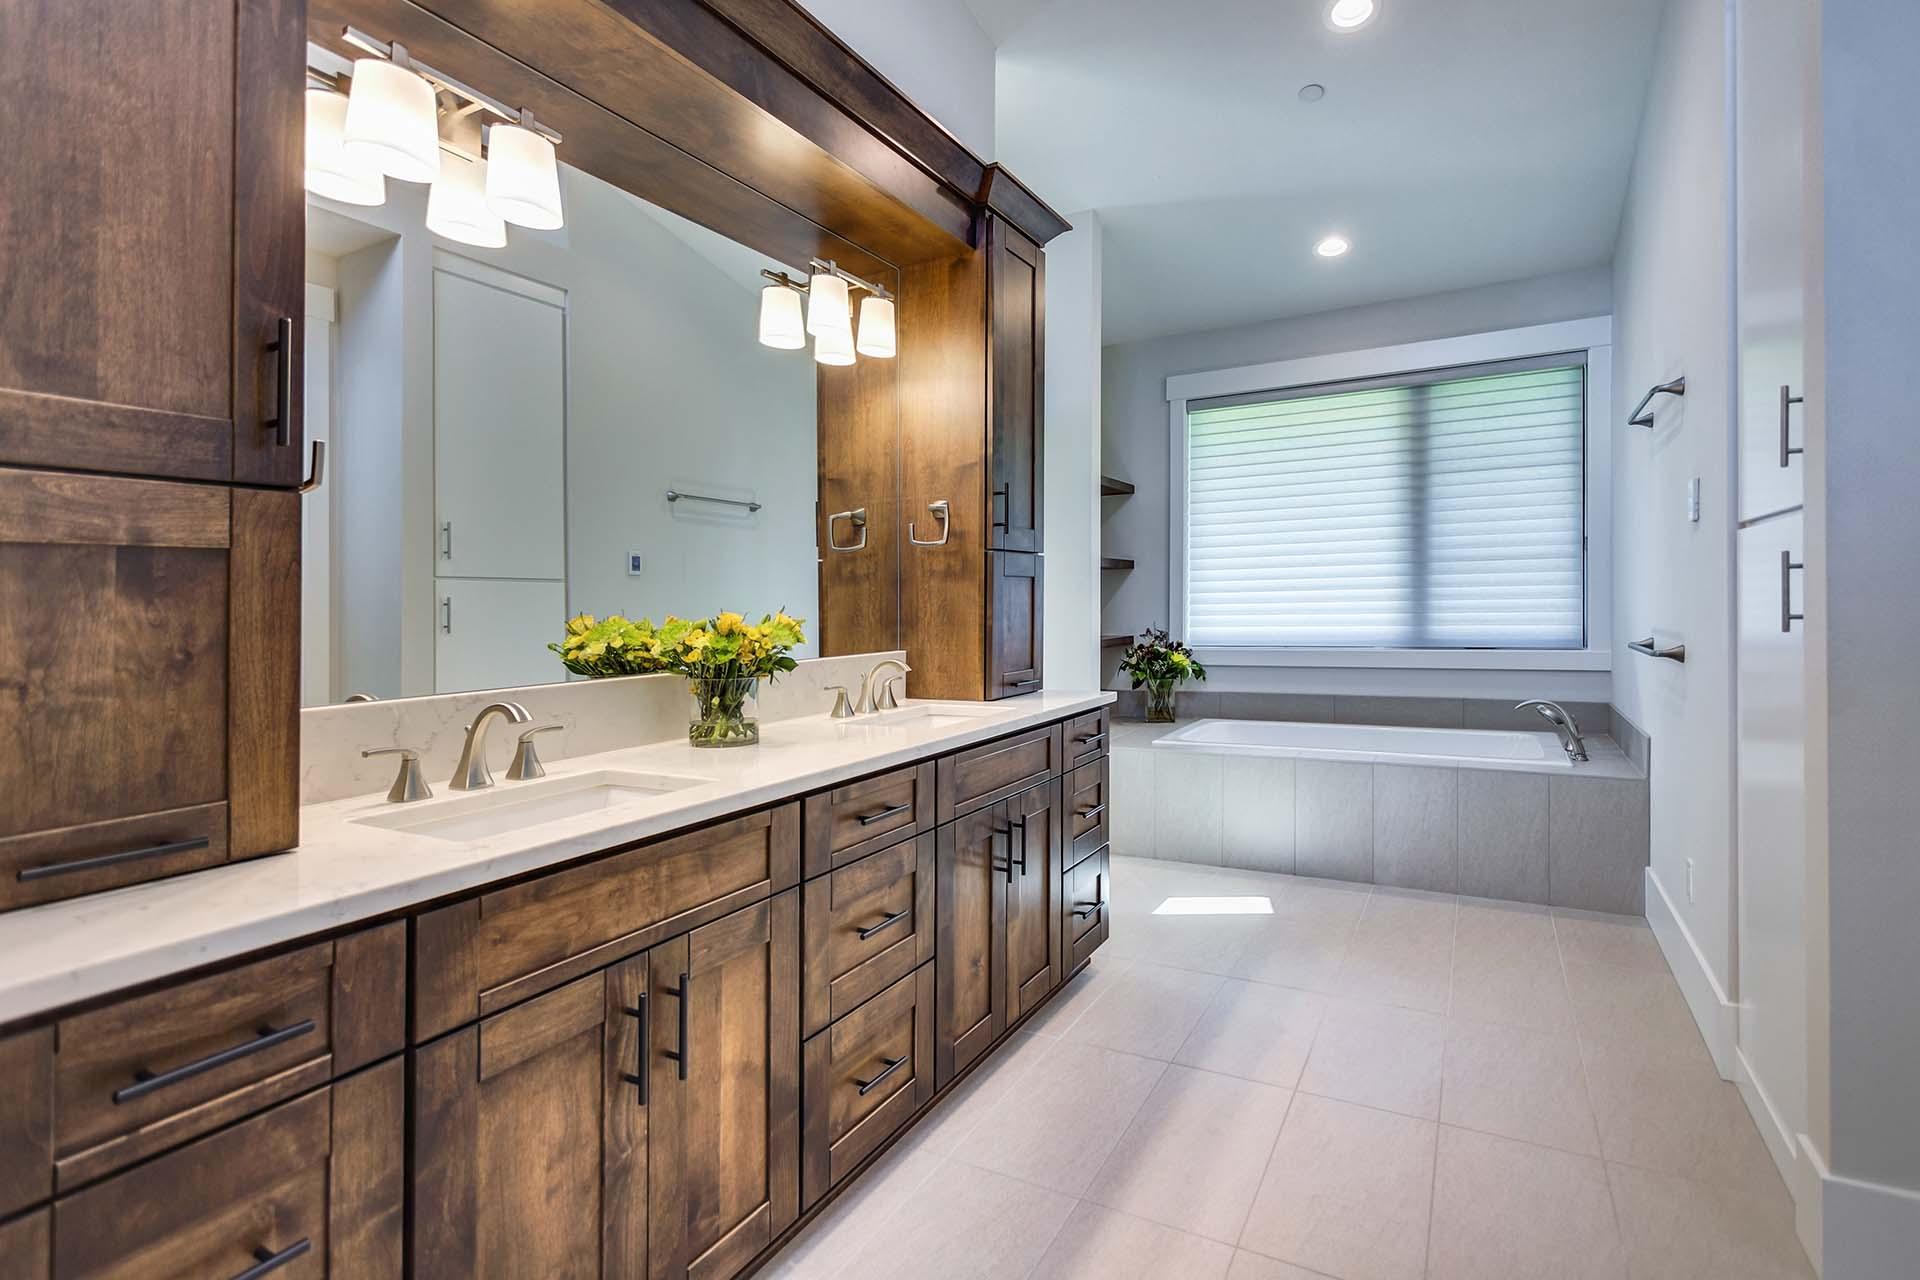 Rustic Bathroom Cabinetry